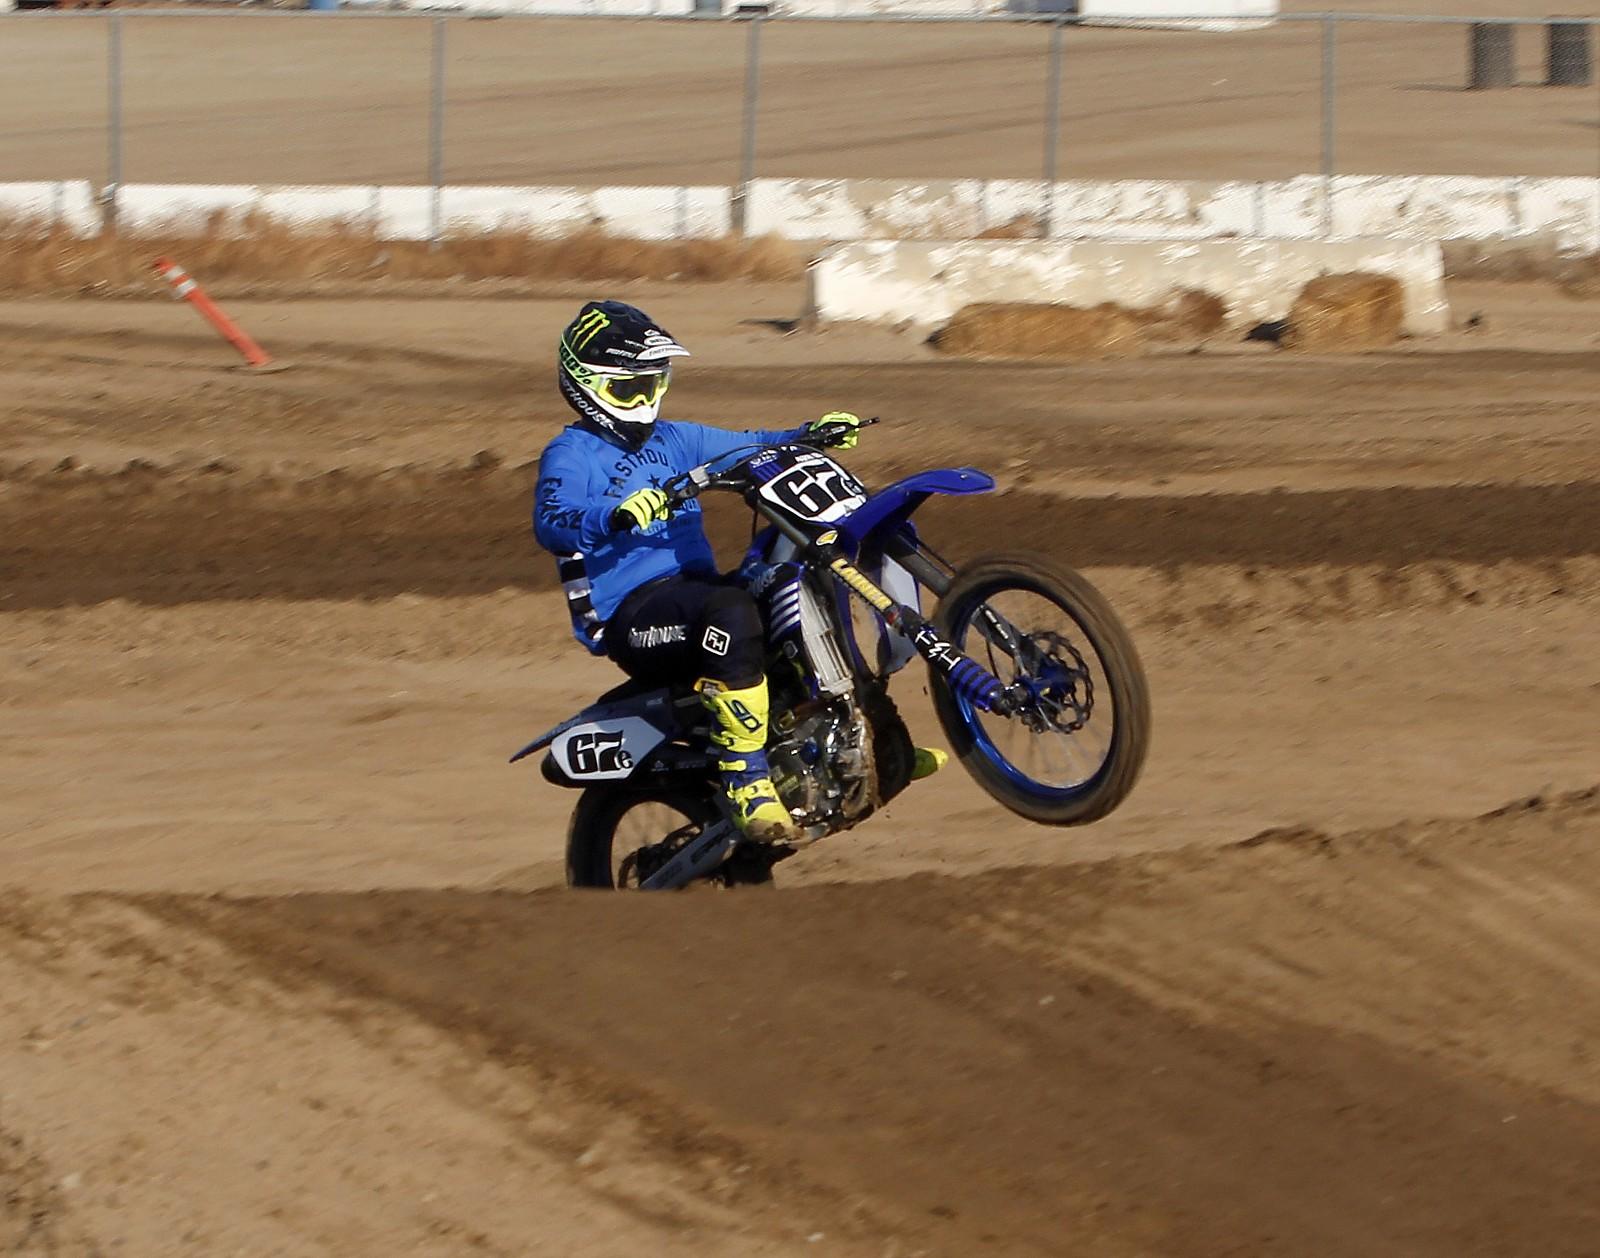 MG 5206 - moto67e - Motocross Pictures - Vital MX